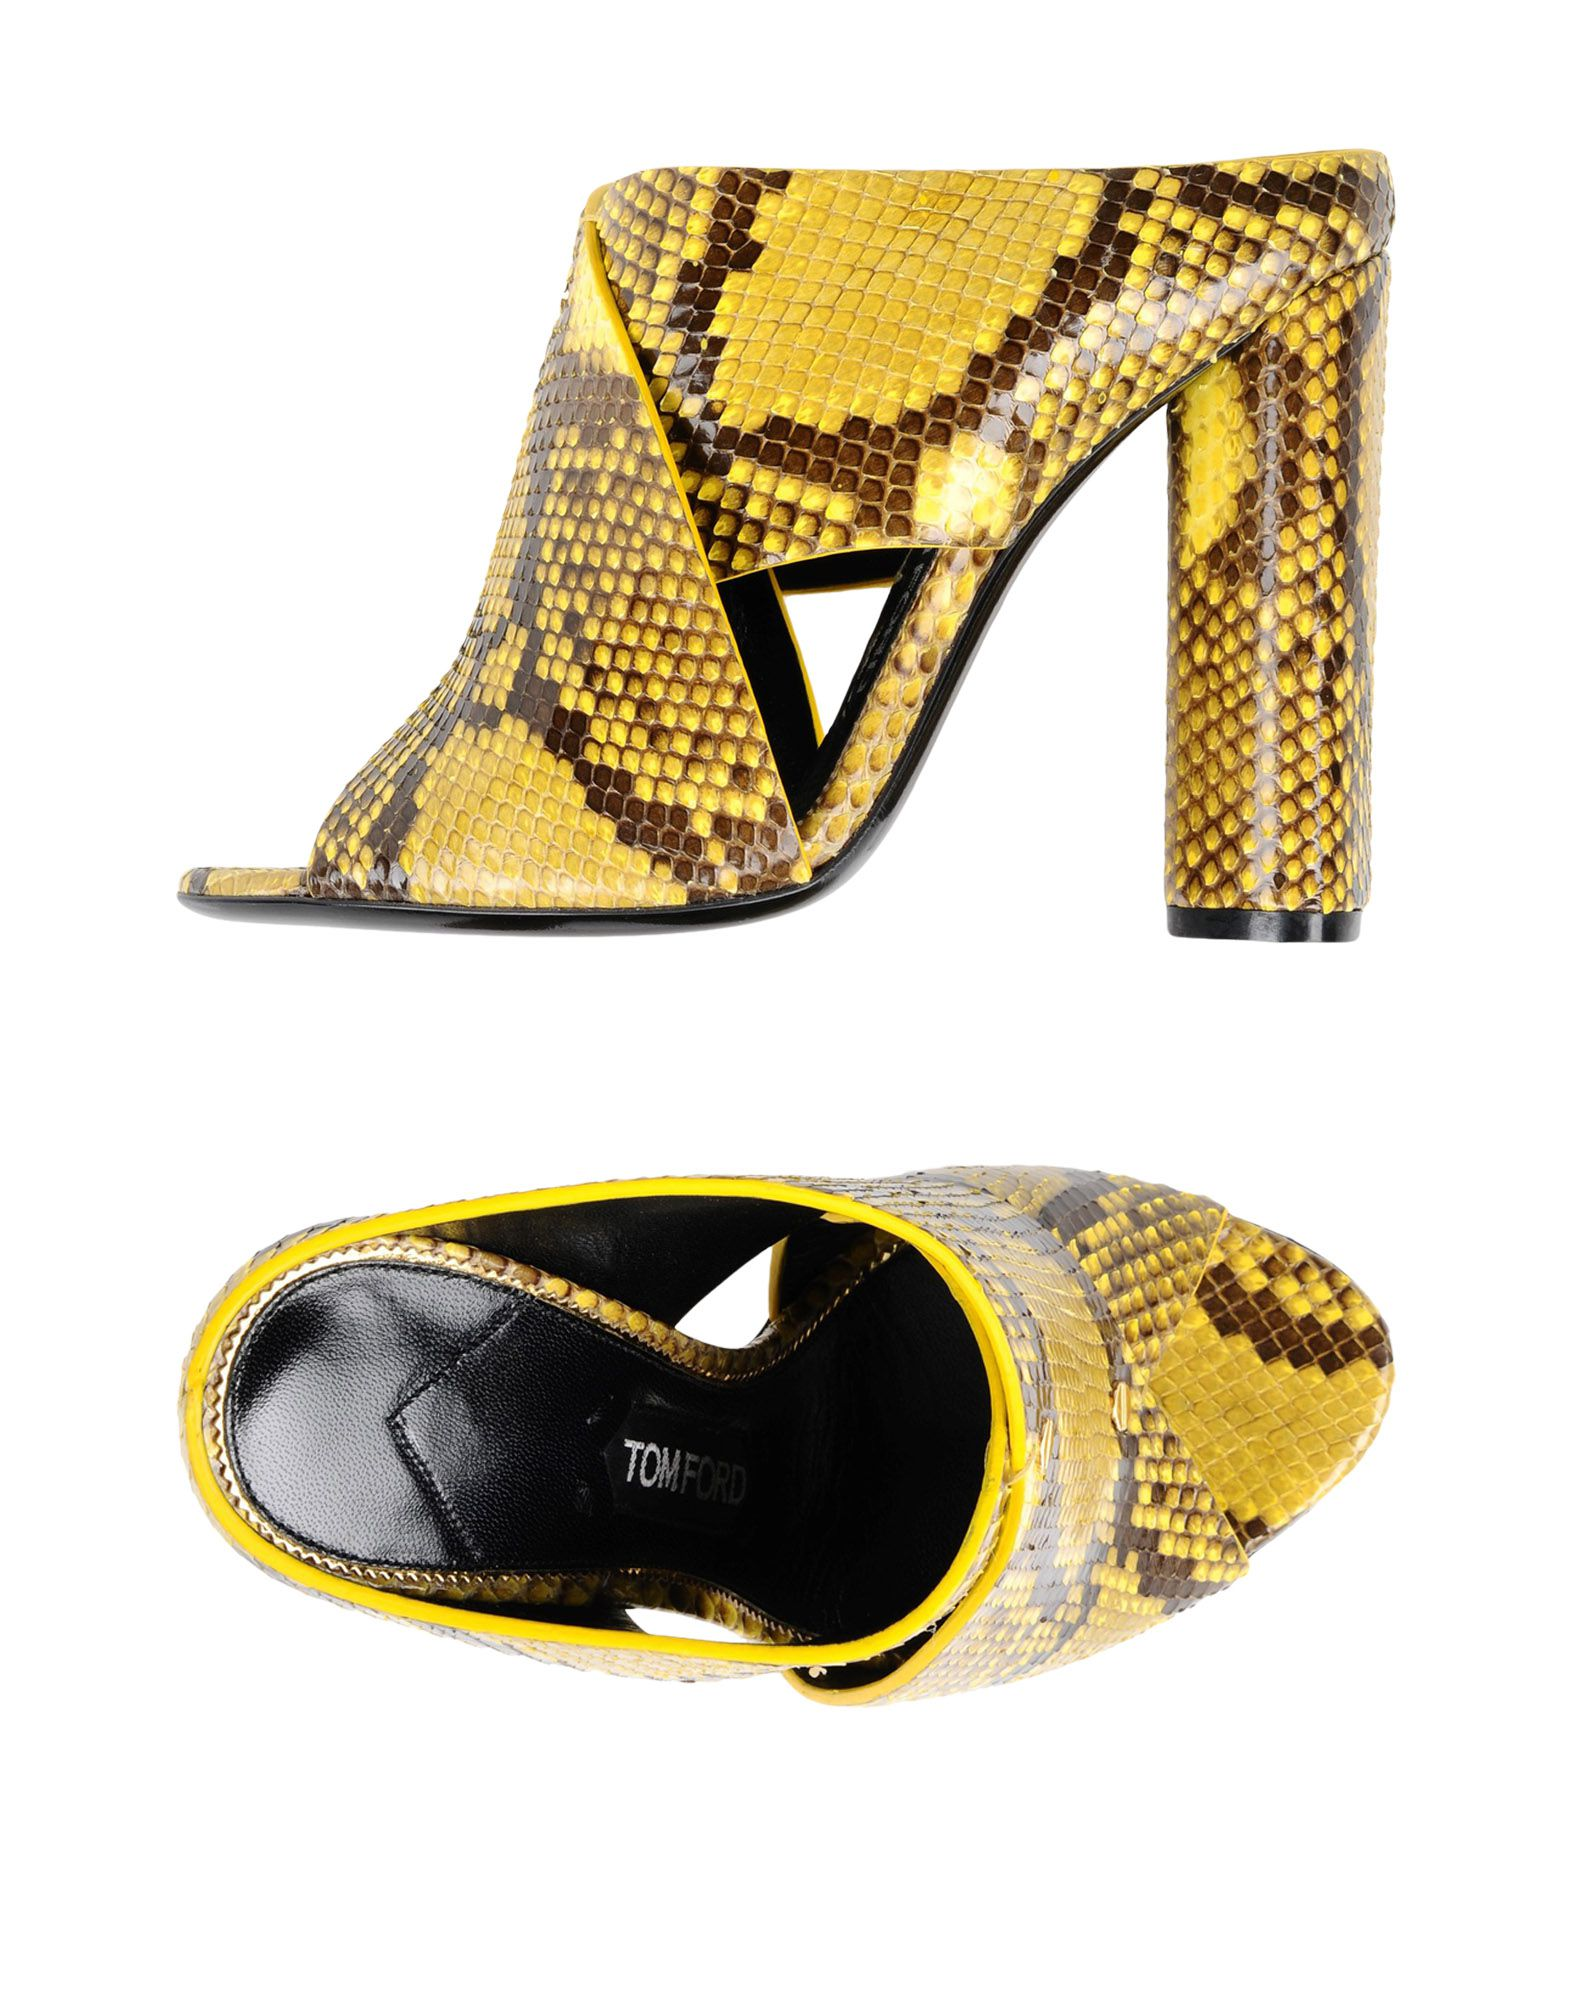 Tom Ford Sandalen 11460924EK Damen  11460924EK Sandalen Beliebte Schuhe 1c5c7a